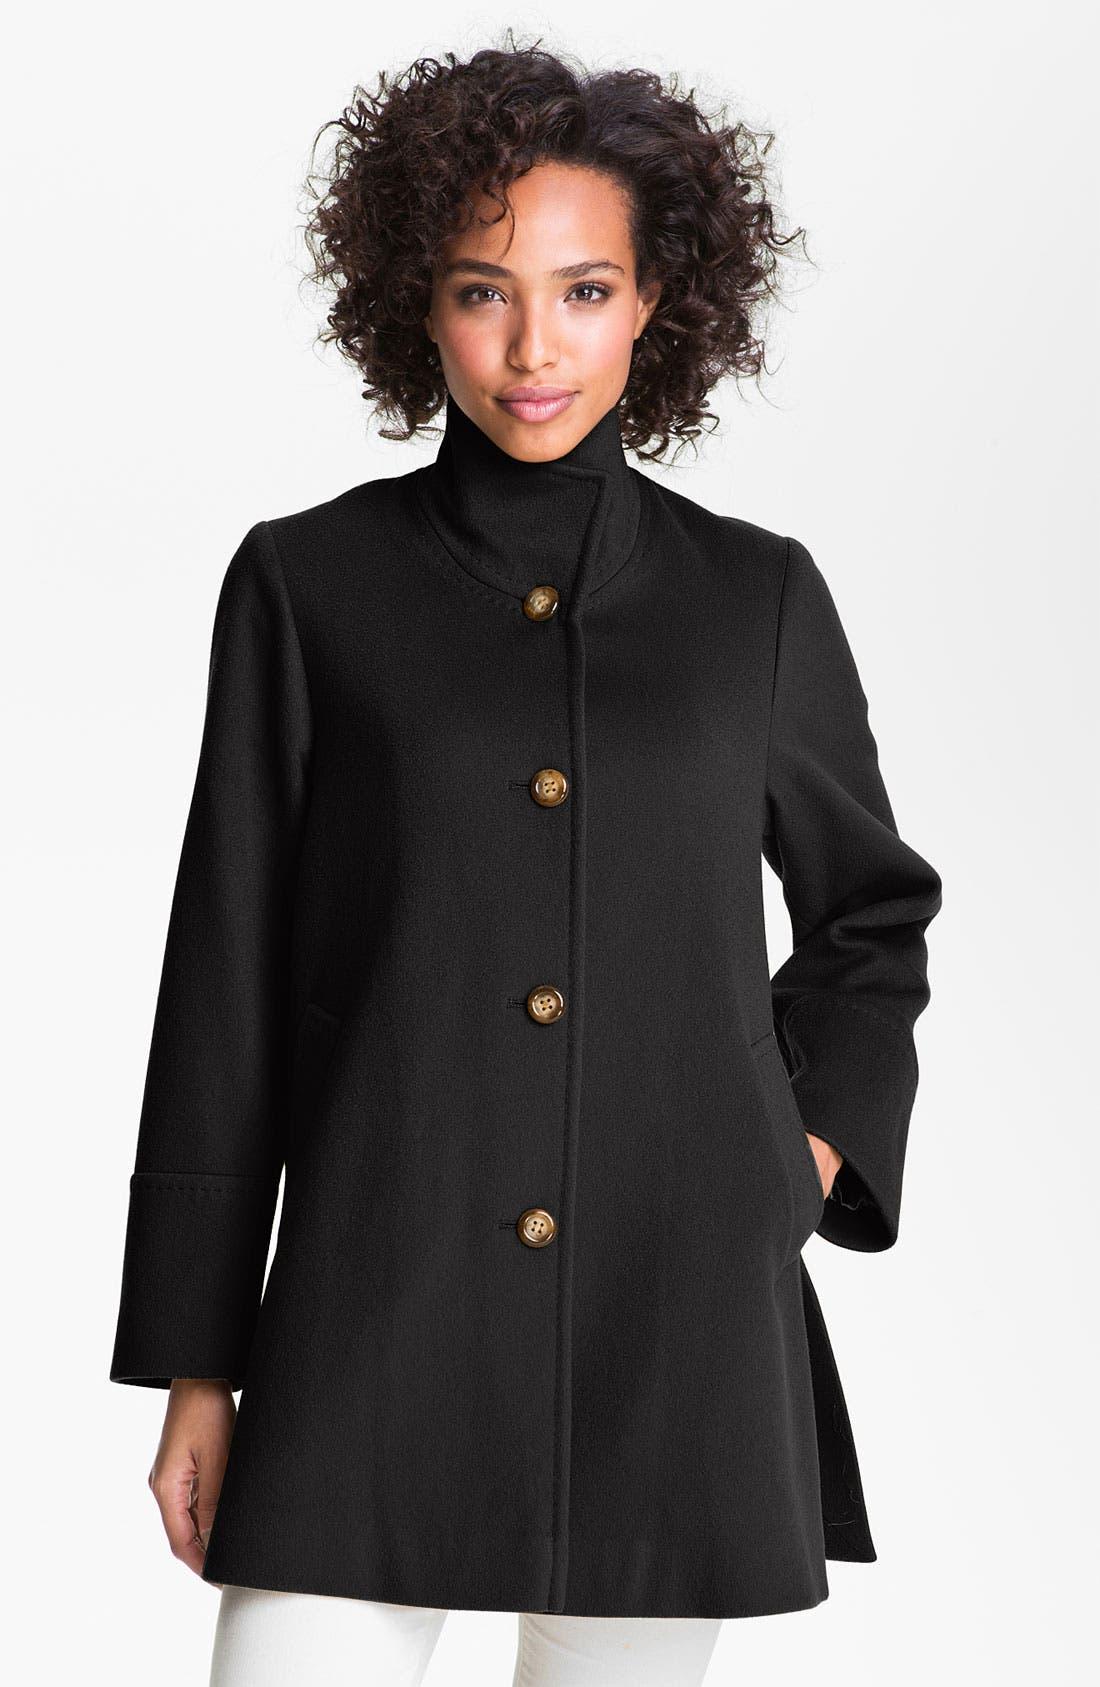 Main Image - Fleurette Stand Collar Loro Piana Wool Jacket (Petite)